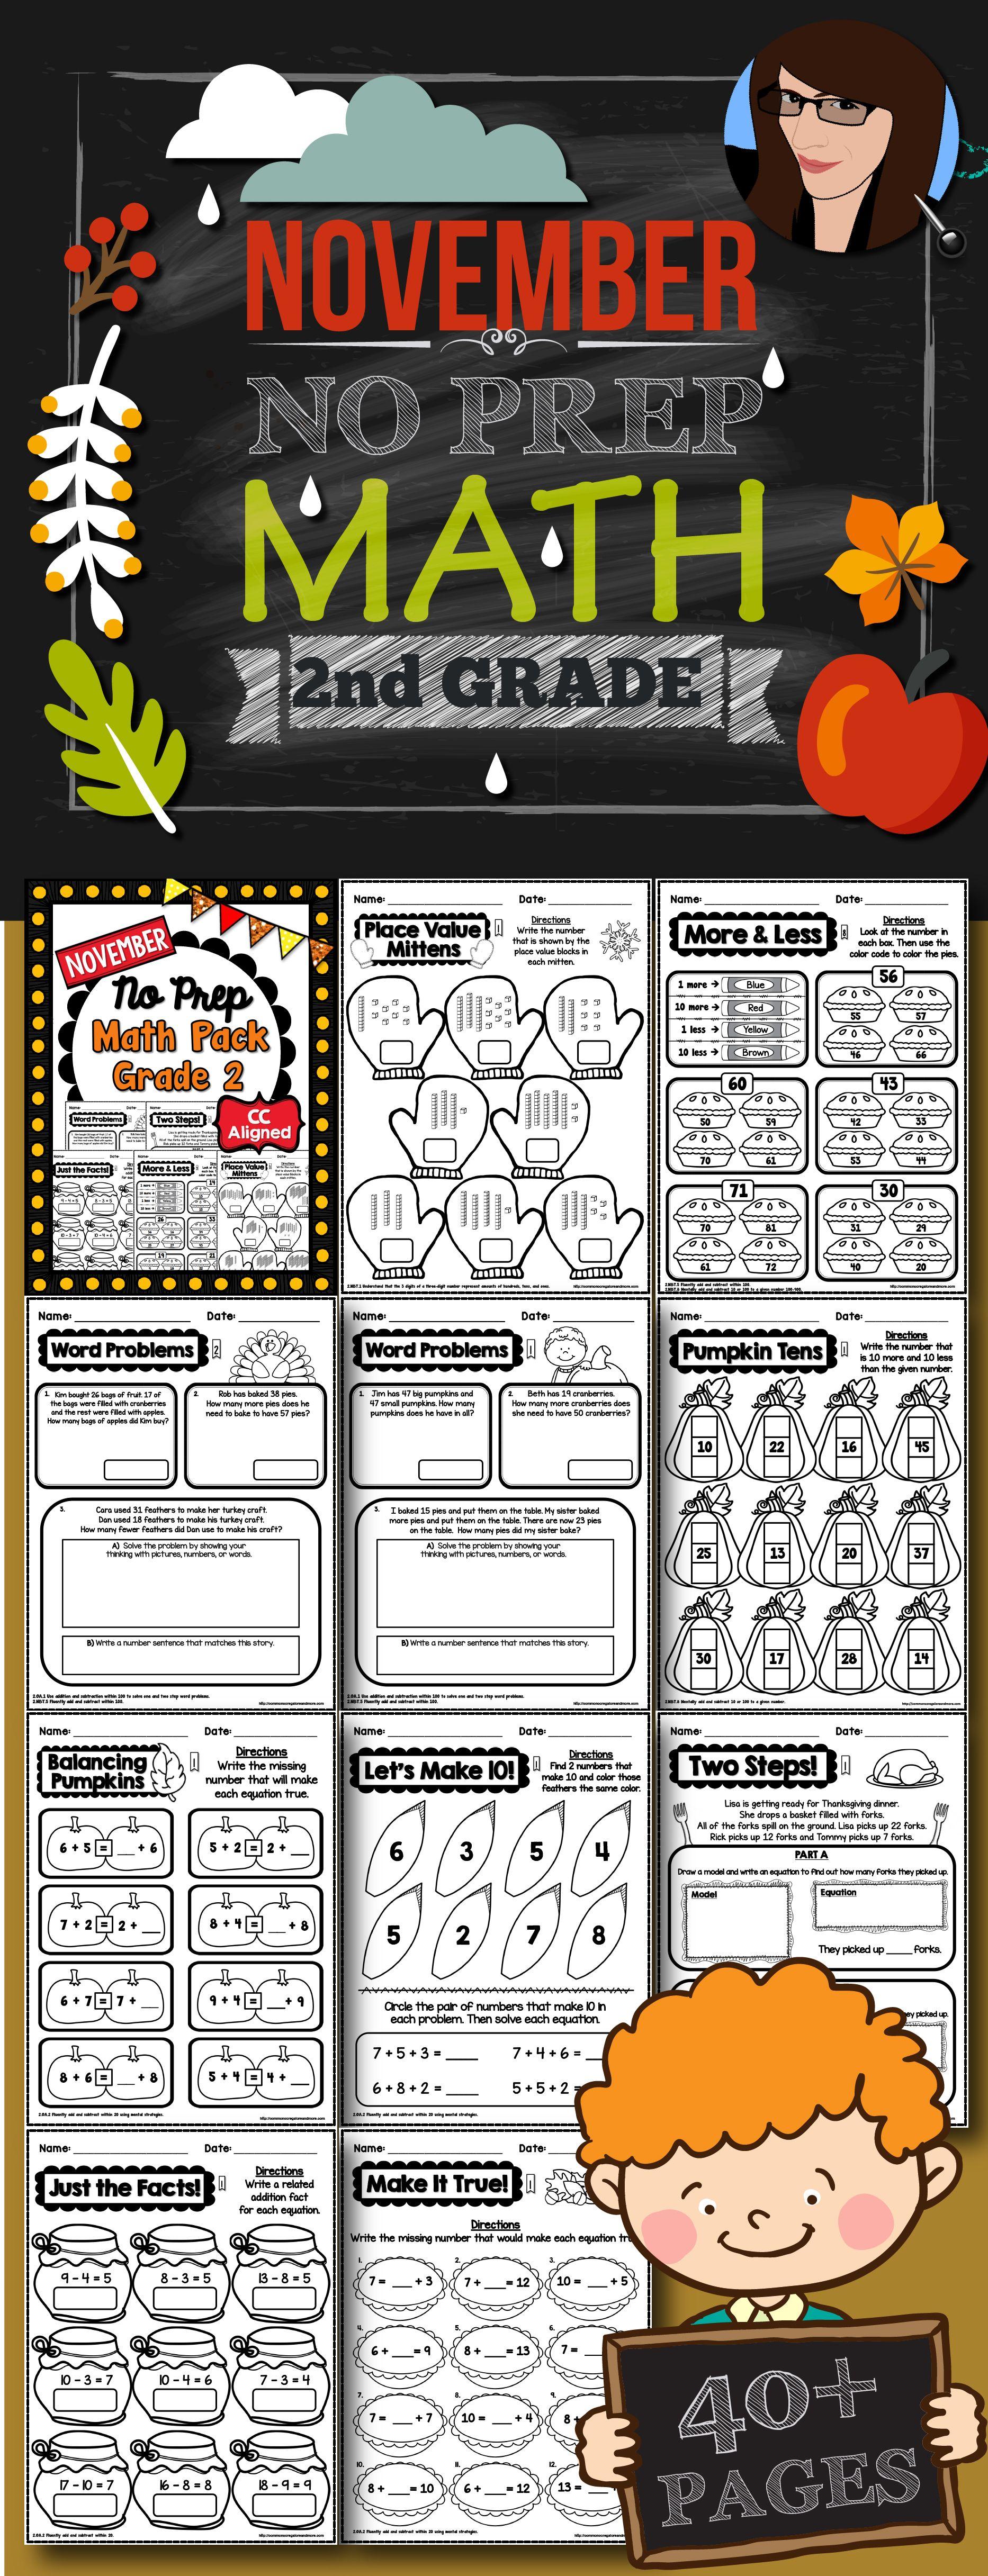 November No Prep Math - 2nd Grade